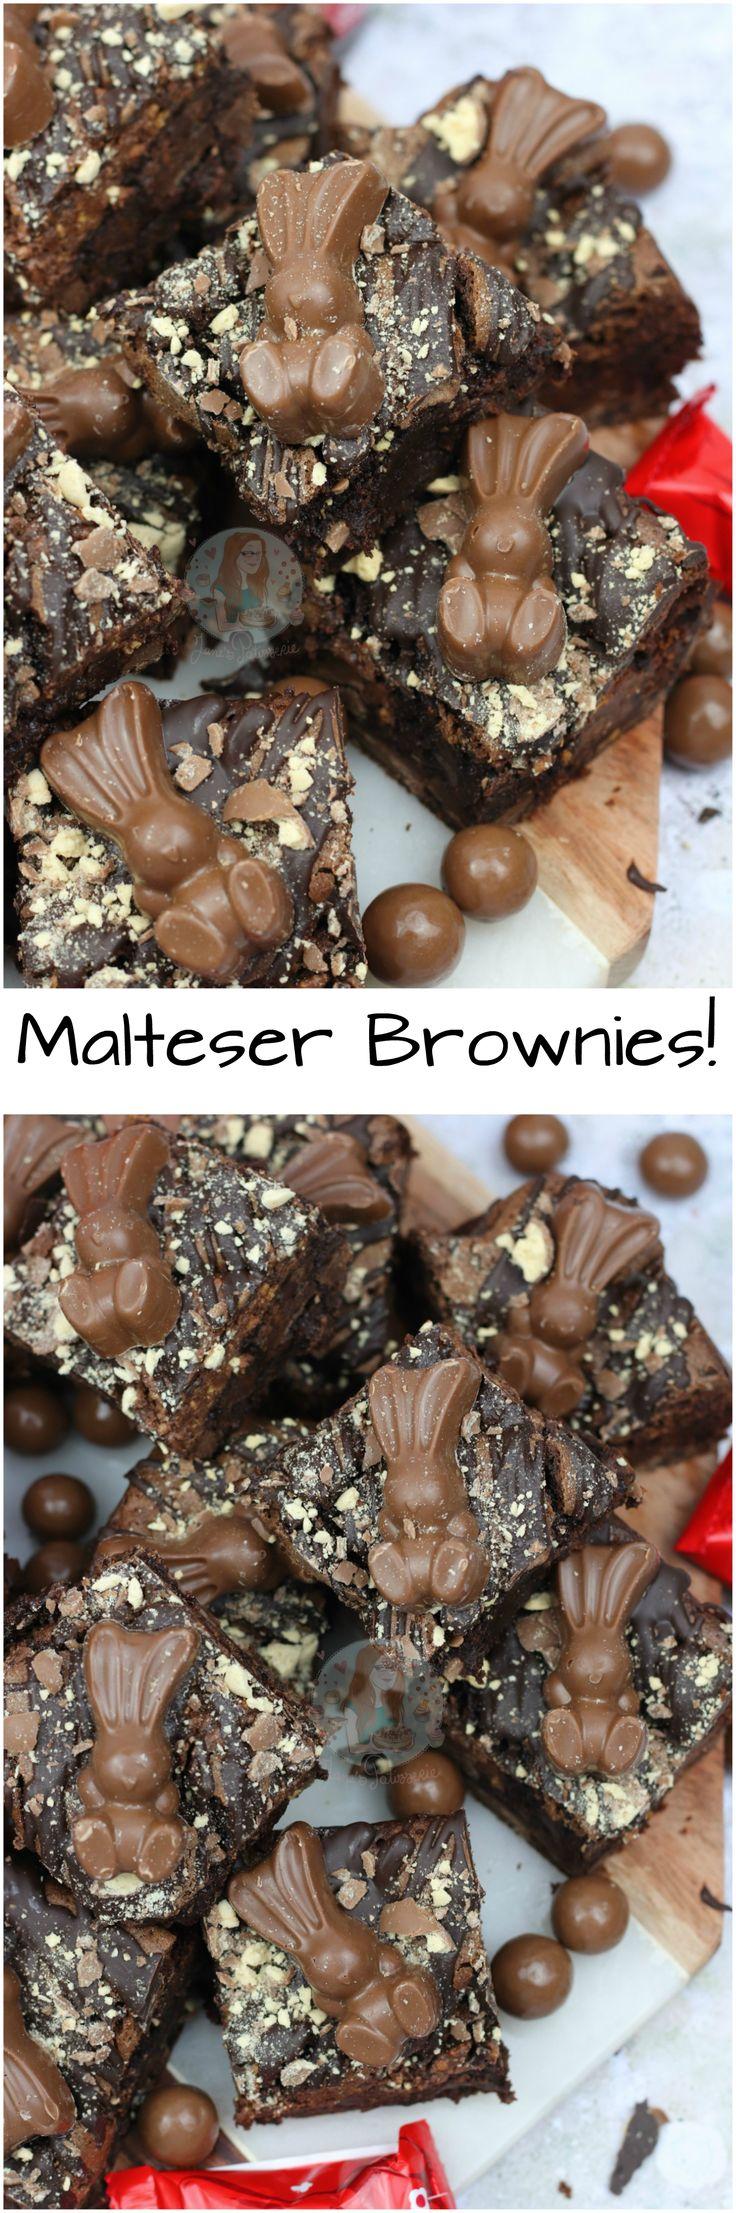 Malteser Brownies!! Fudgey, Chocolatey, Gooey Malt Chocolate Brownies with Malteser Spread, Maltesers and Malteser Bunnies! Perfect Malteser Brownies.